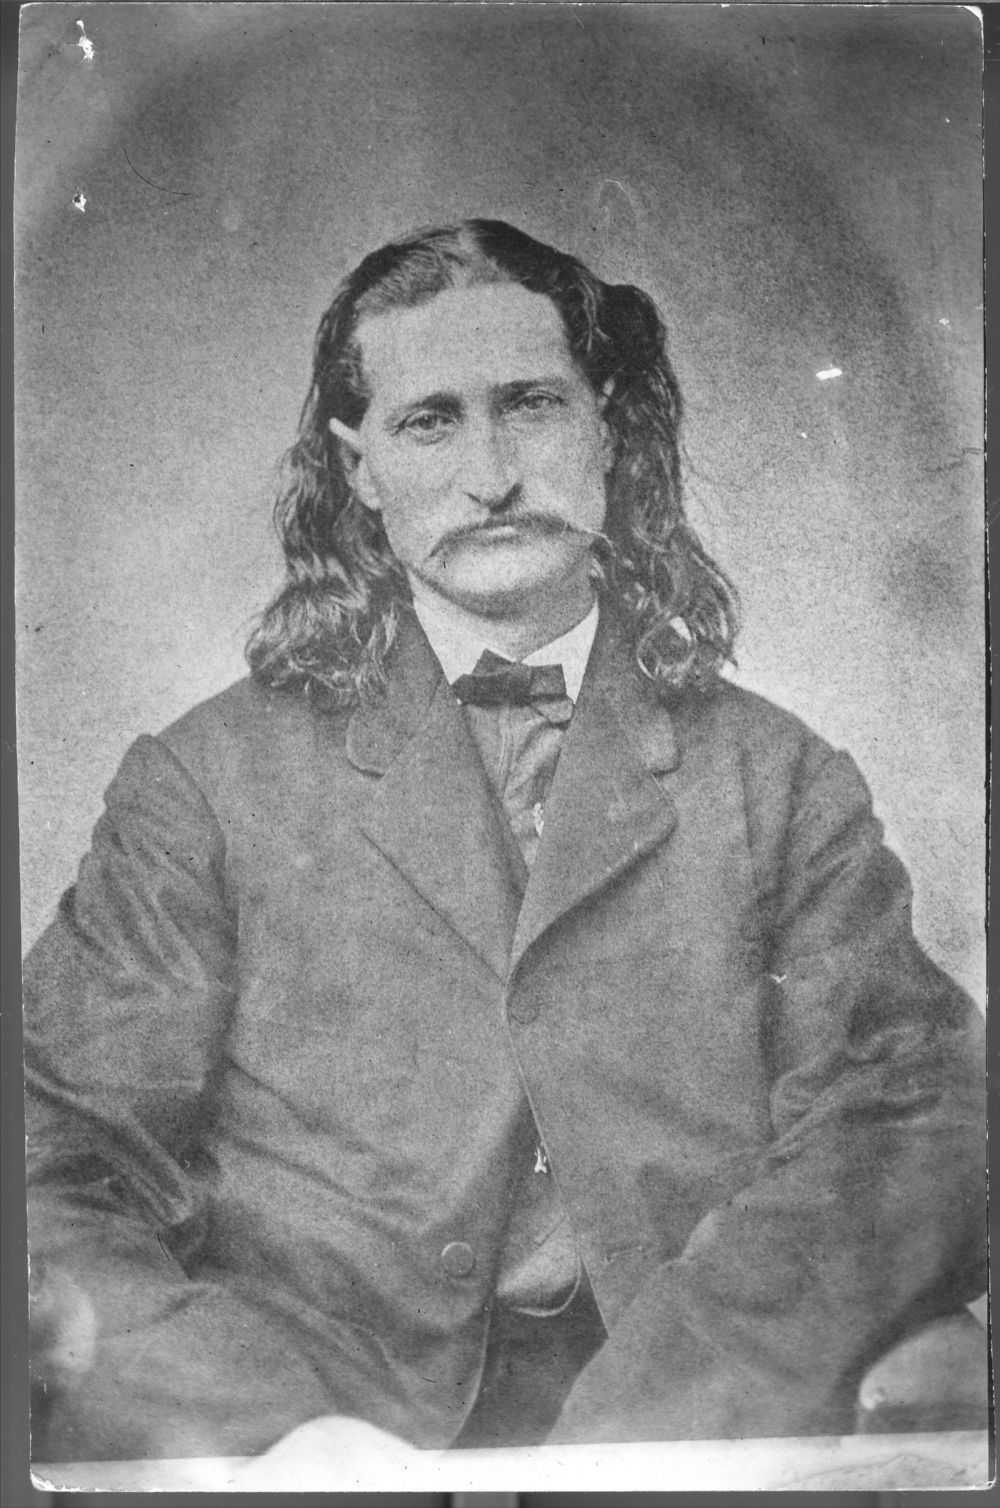 James Butler (Wild Bill) Hickok